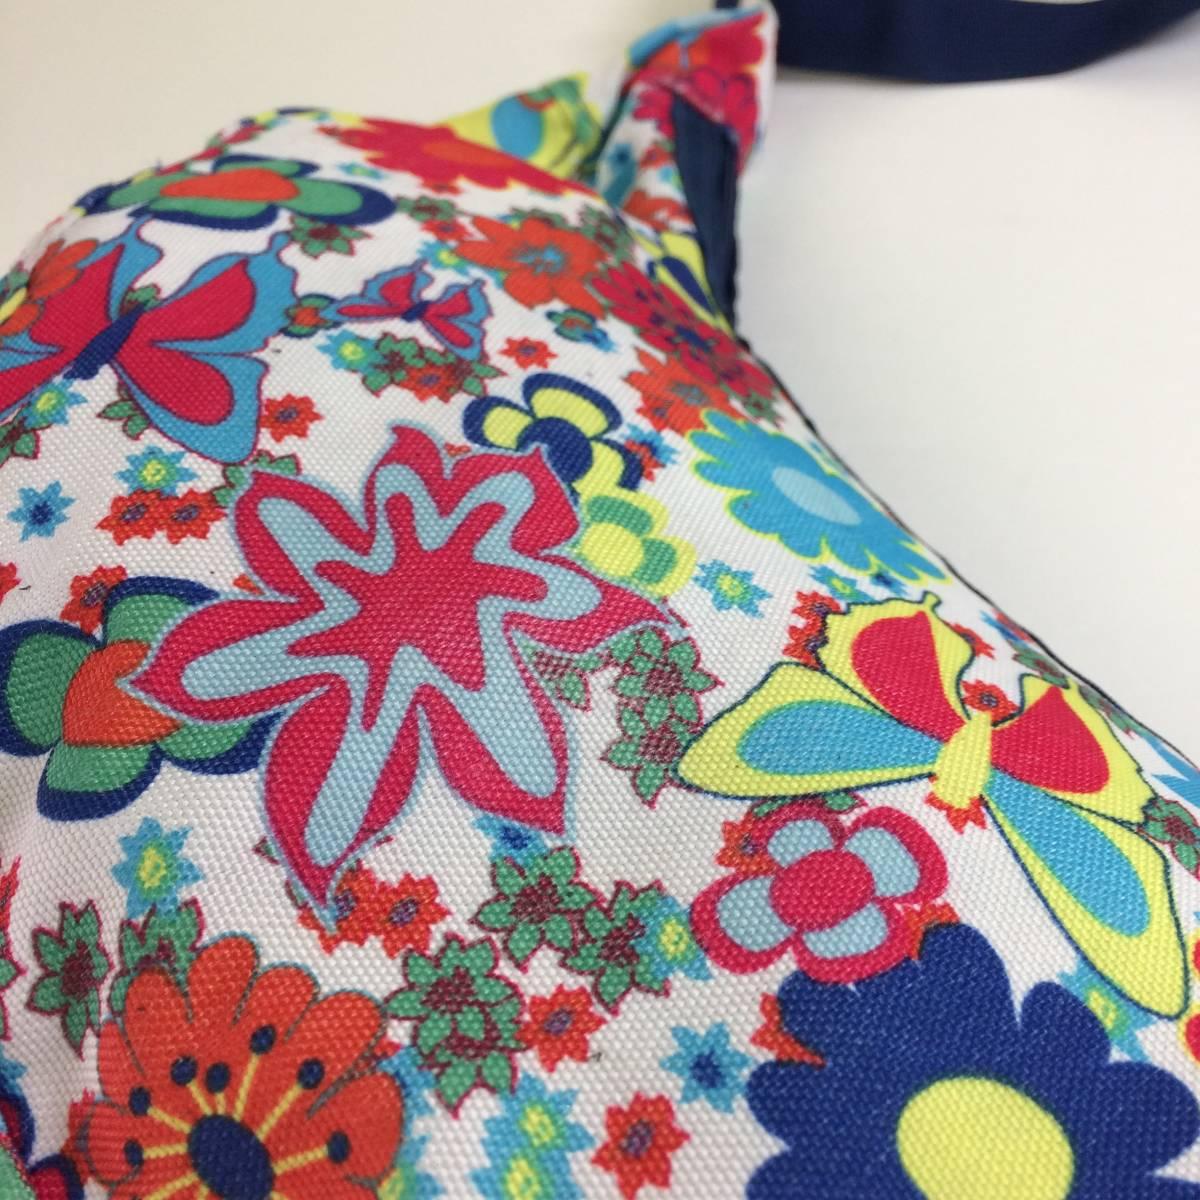 USA製 グレゴリー ラフィンバッグ ラフィン gregory 花柄 ワイルドフラワー アメリカ製 旧タグ 三日月型バッグ ショルダーバッグ